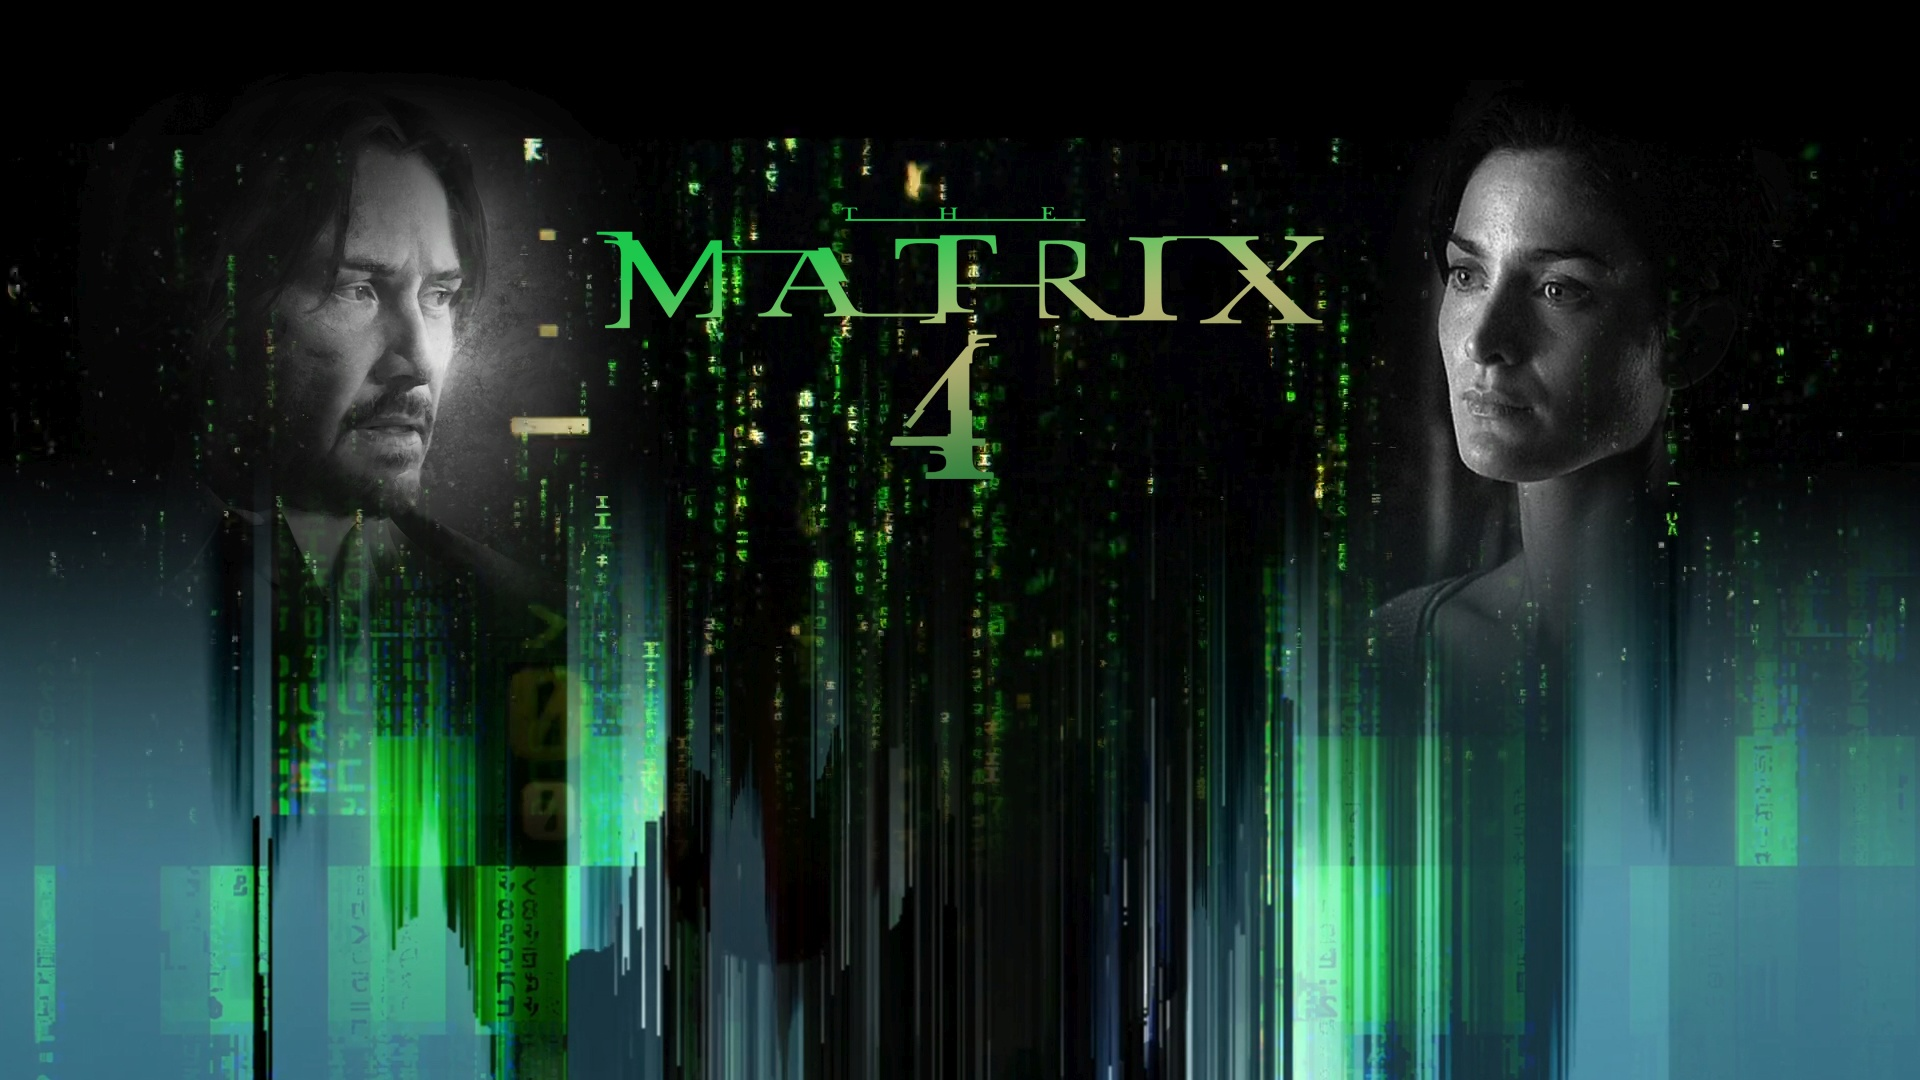 The Matrix 4 windows background